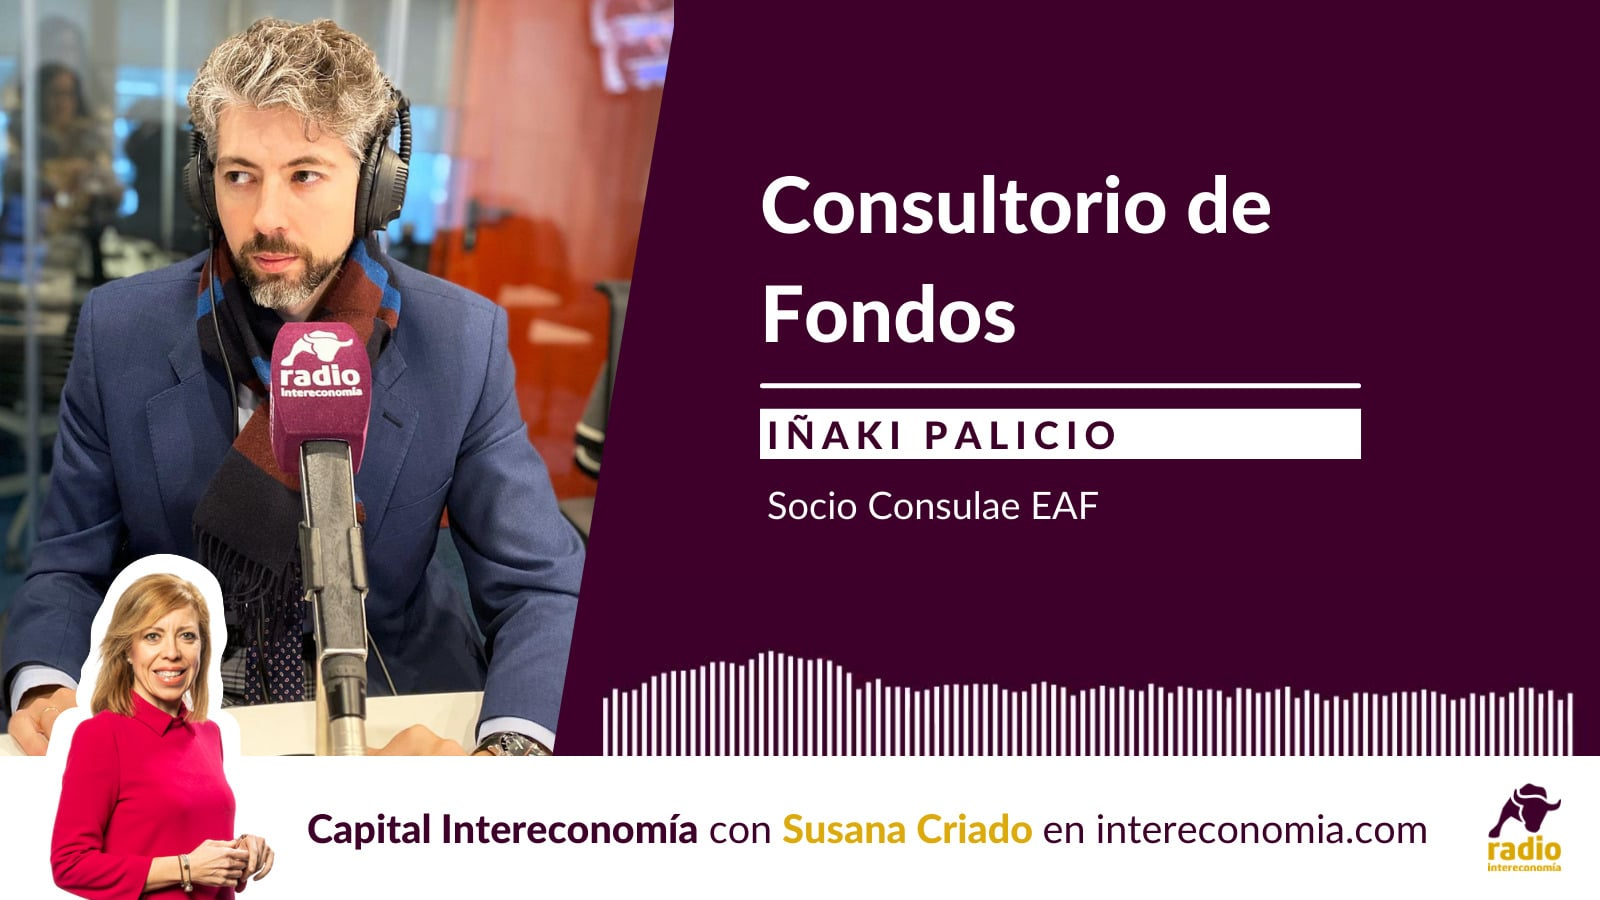 Consultorio de Fondos con Iñaki Palicio(Consulae EAF) 20/09/2021